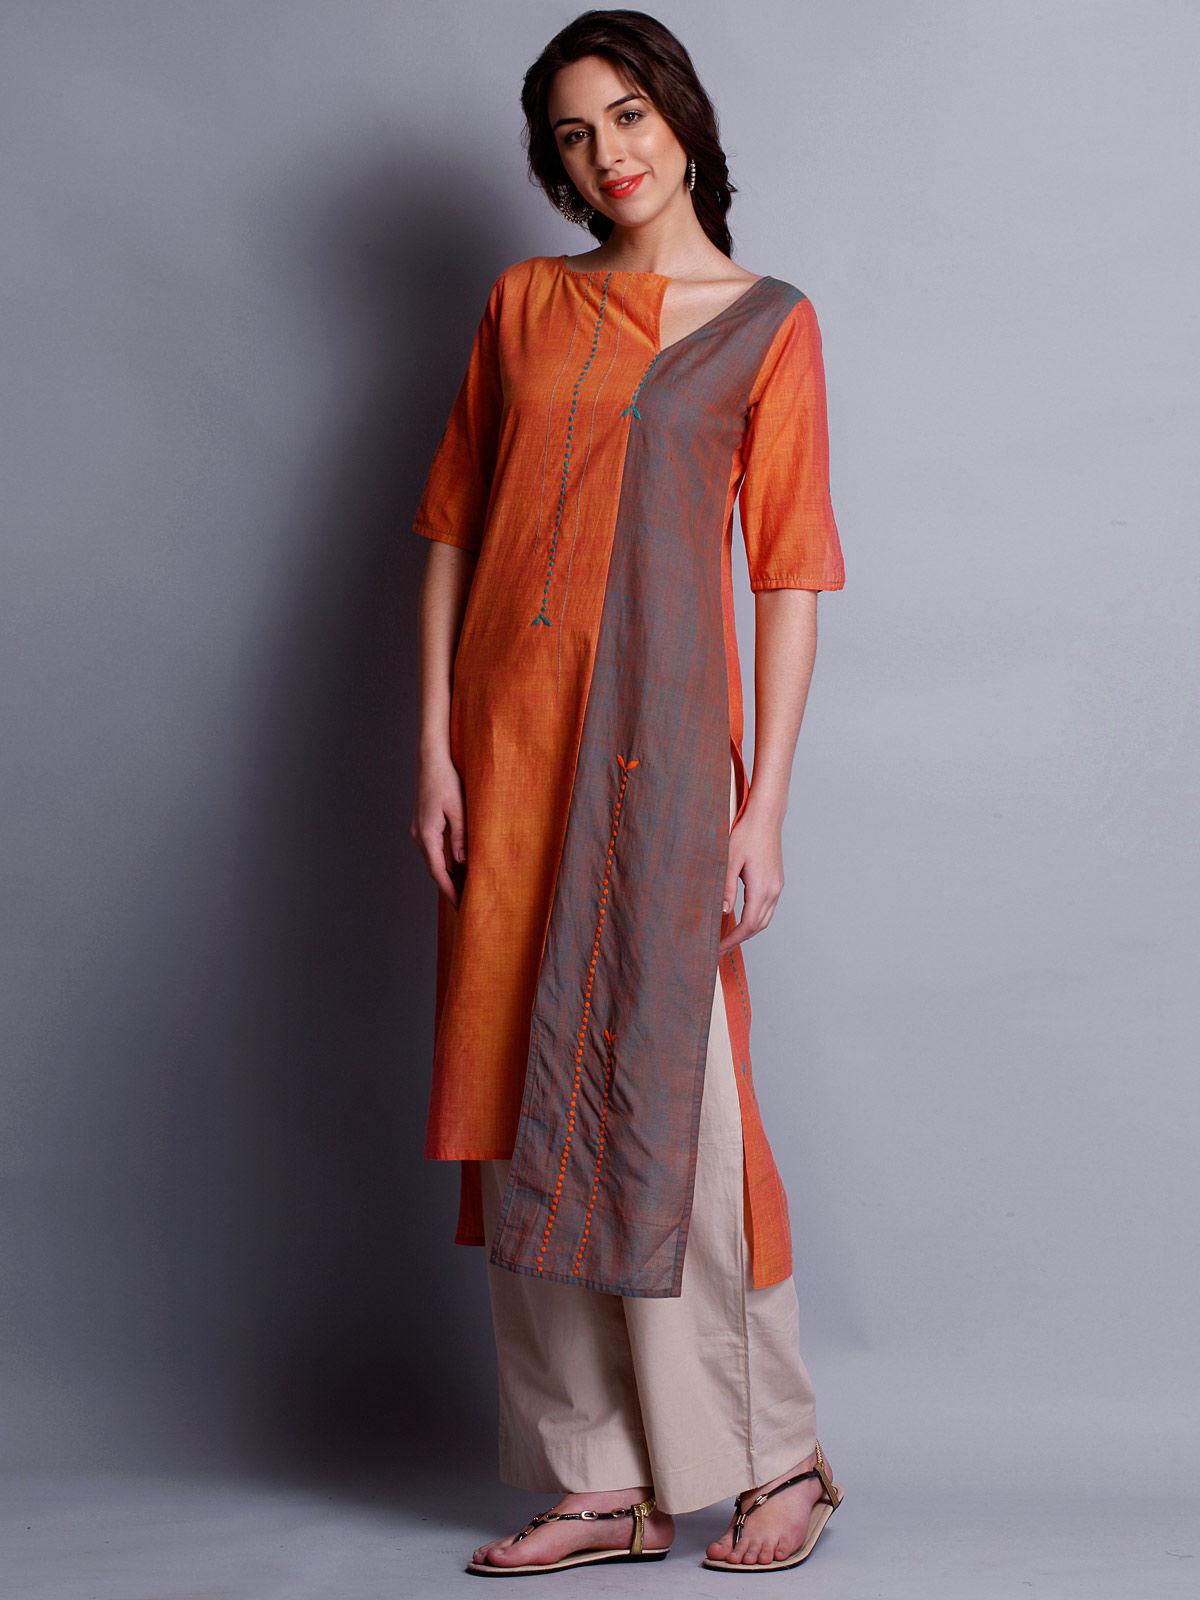 Patti work embroidered orange long kurta